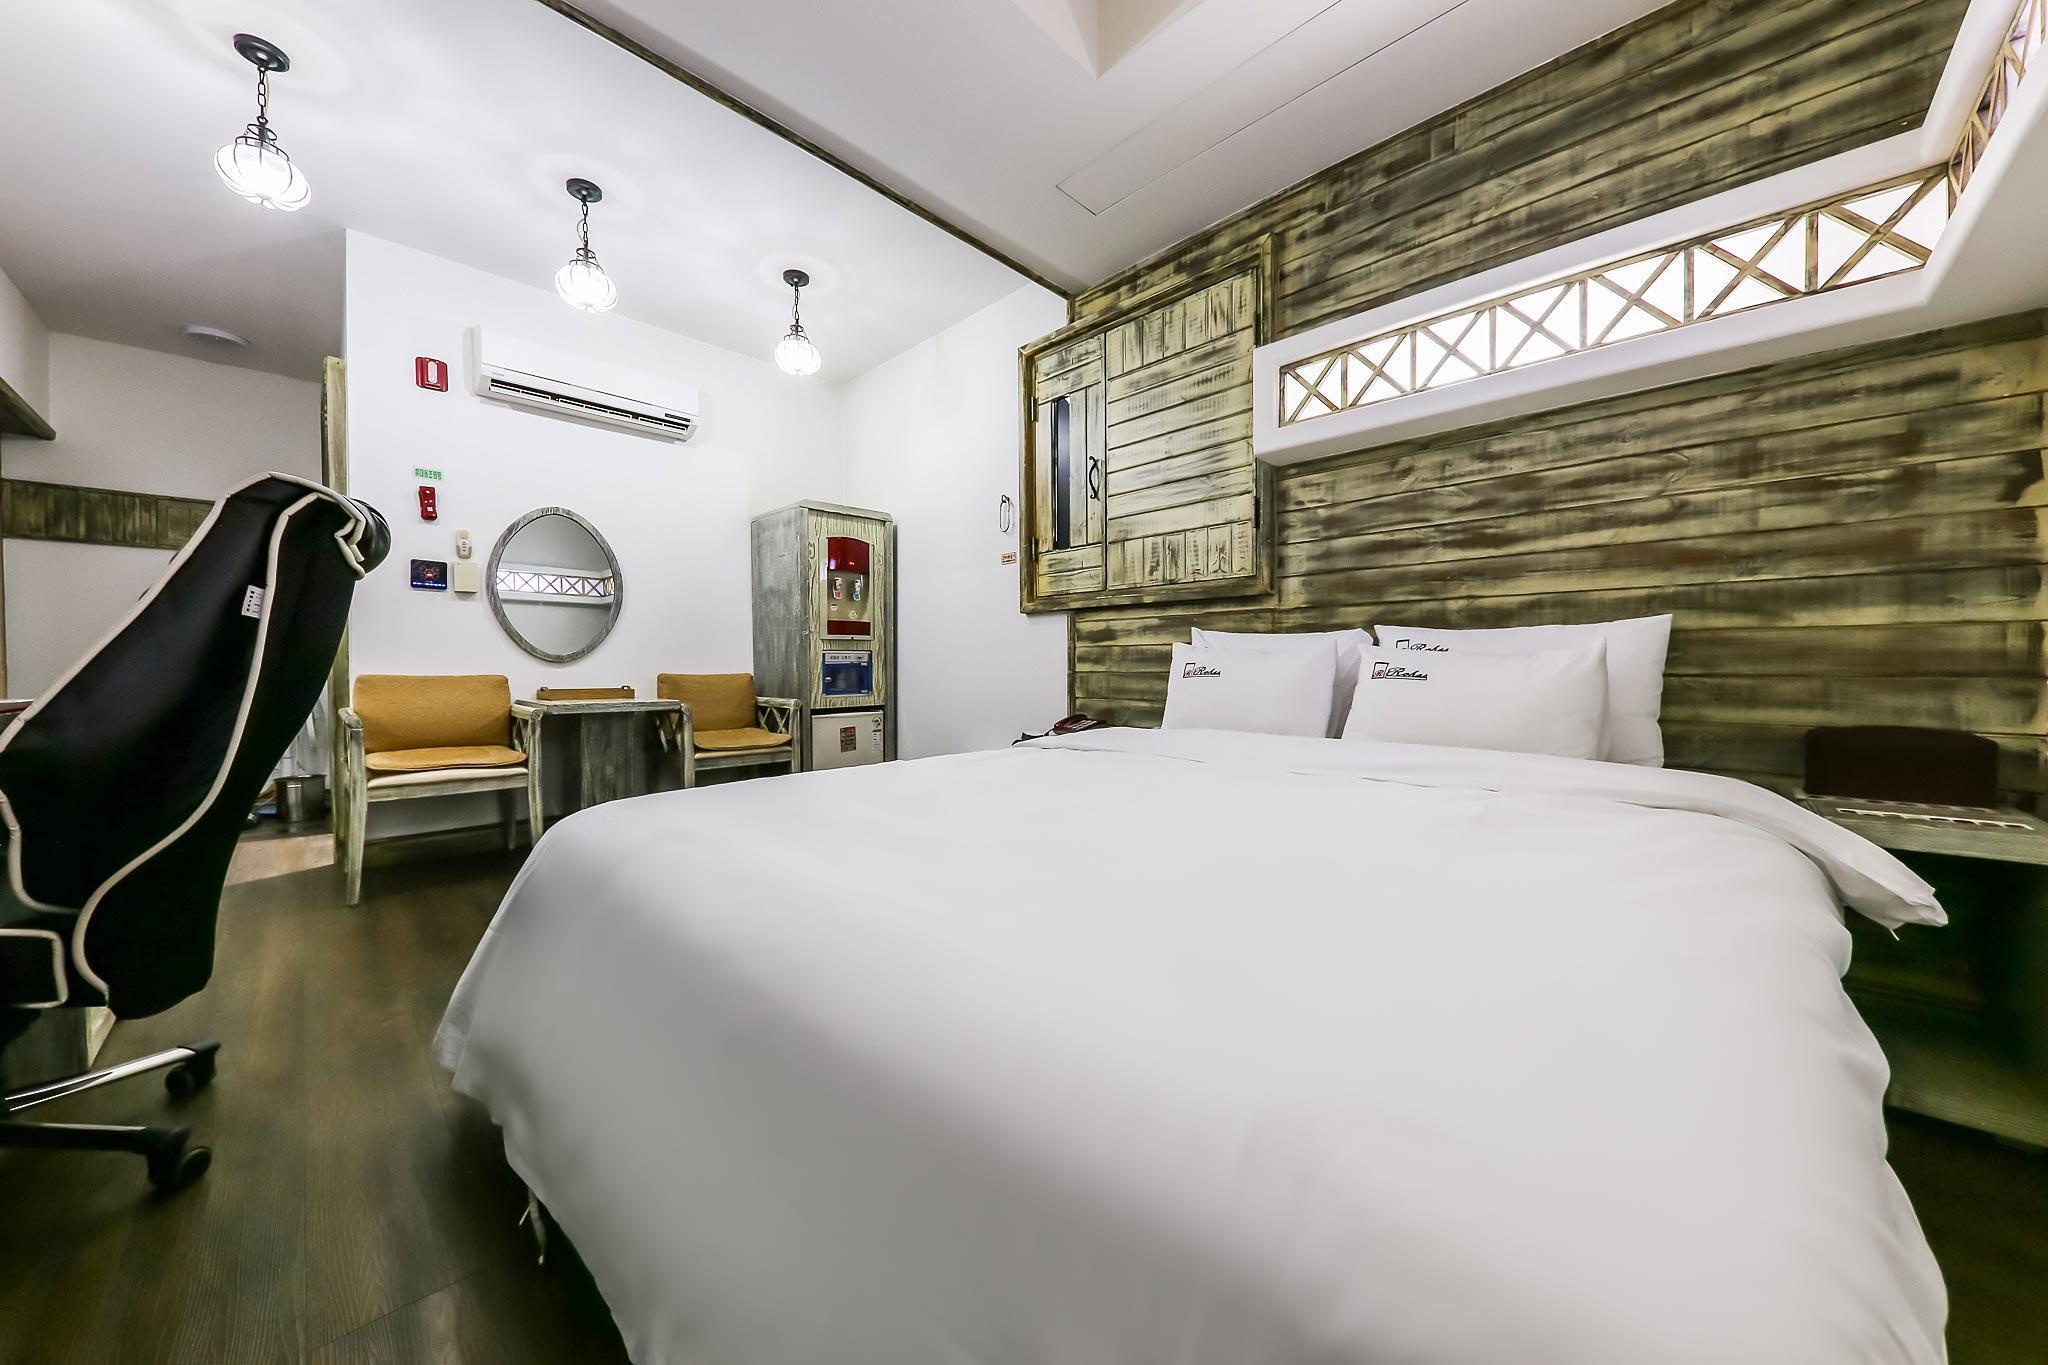 Sintanjin Rohas Motel, Cheongwon